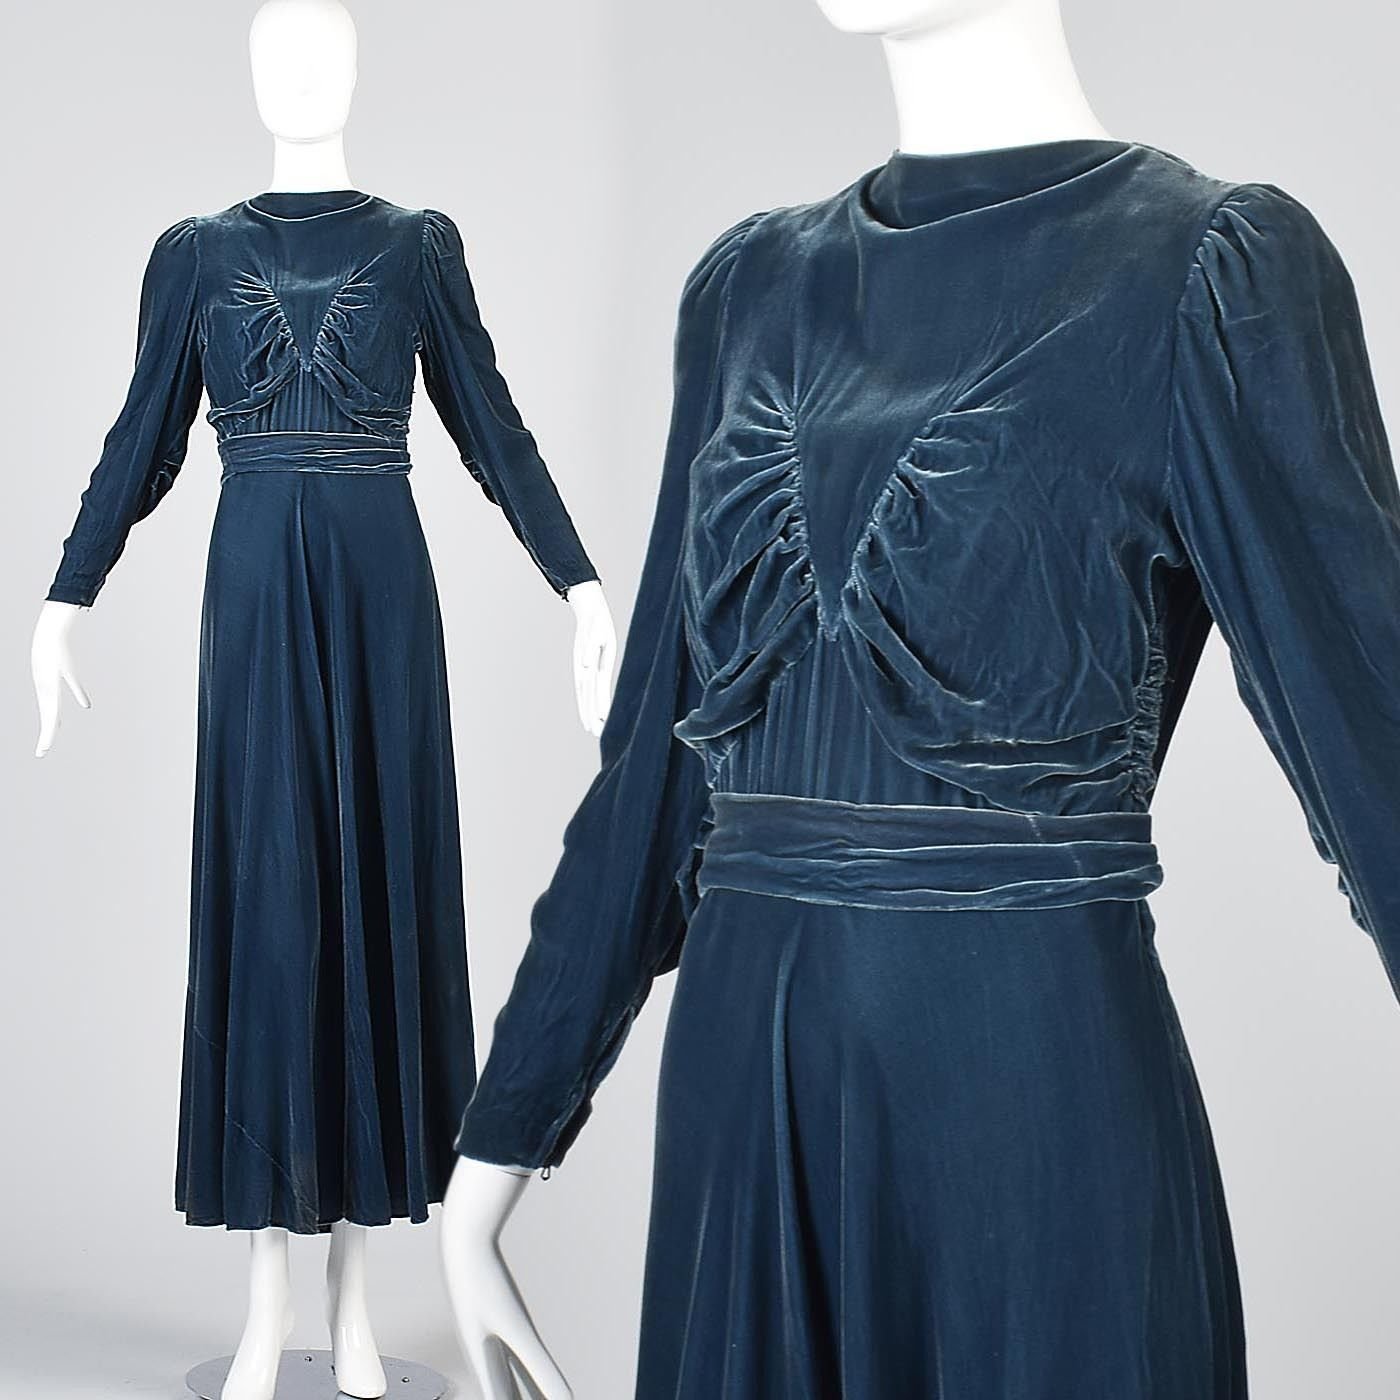 Vintage 1930s 30s Formal Gown Evening Dress Long Sleeve Maxi Blue Velvet Autumn Ebay Long Sleeve Evening Dresses Blue Velvet Gown Velvet Gown [ 1400 x 1400 Pixel ]